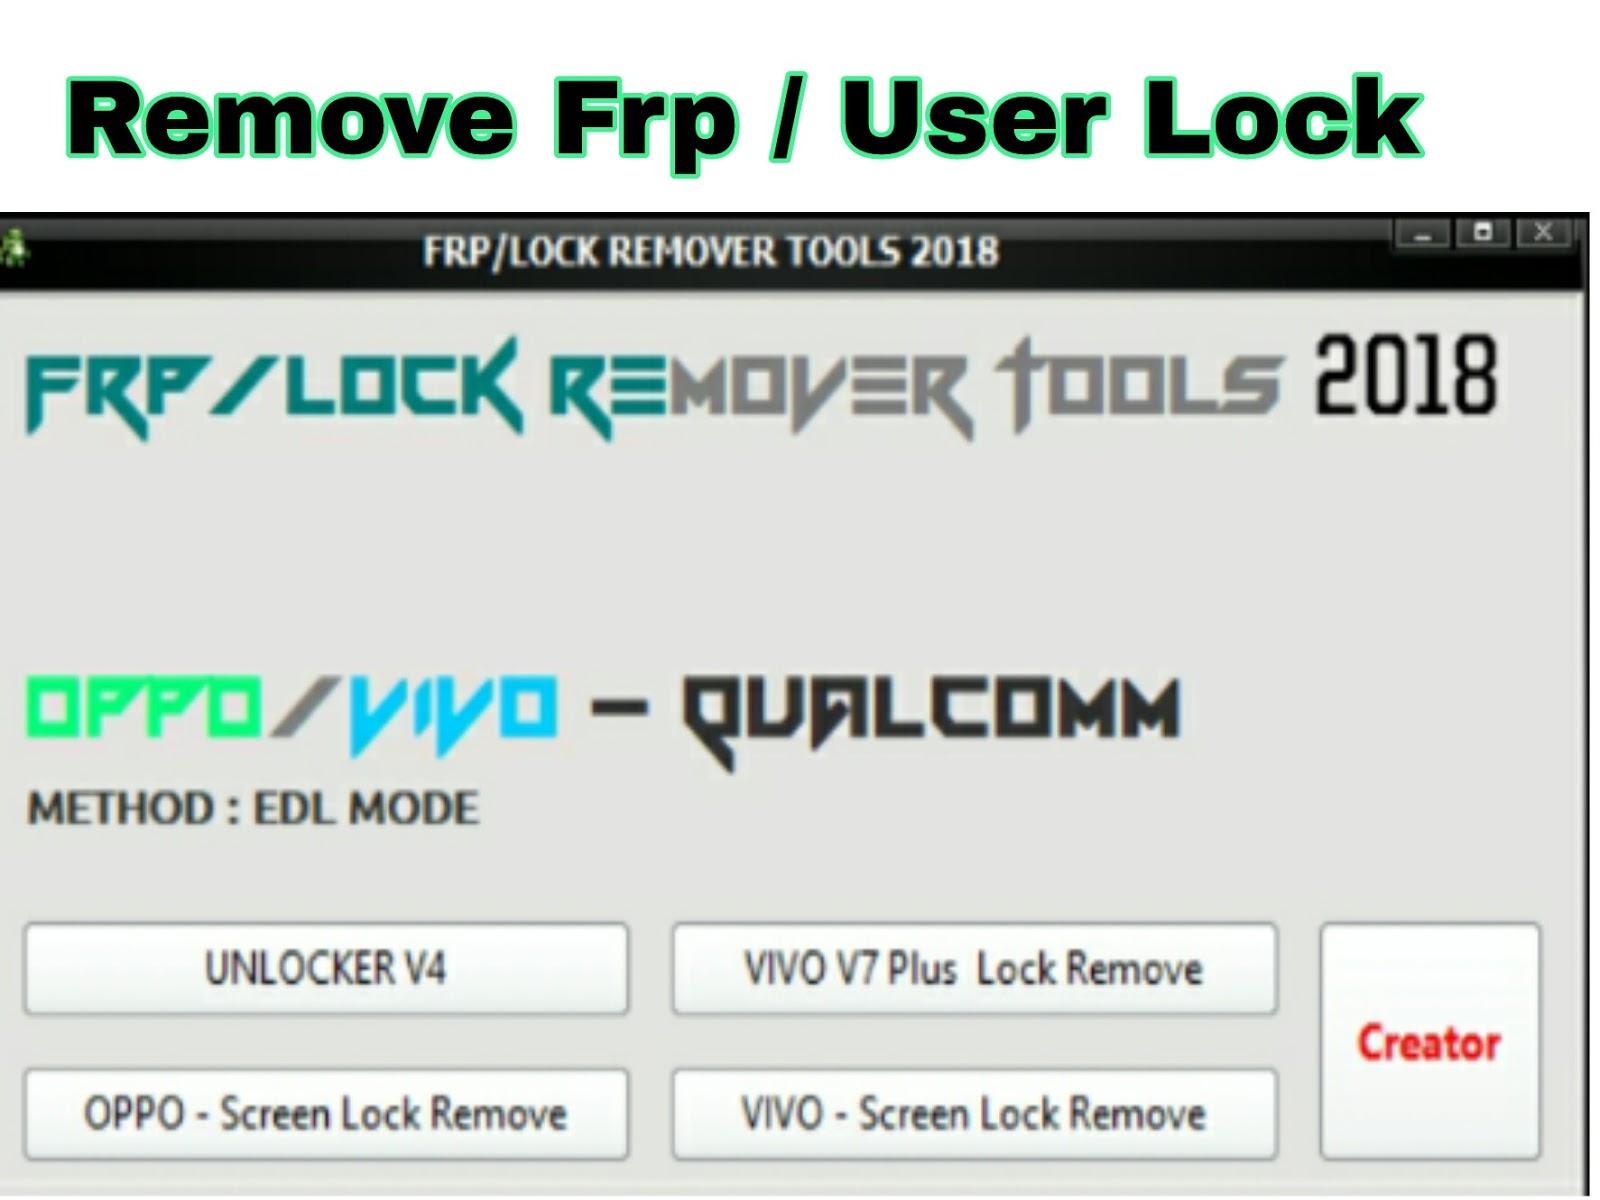 Frp Userlock Remover Tool 2018 Free Download Amazing